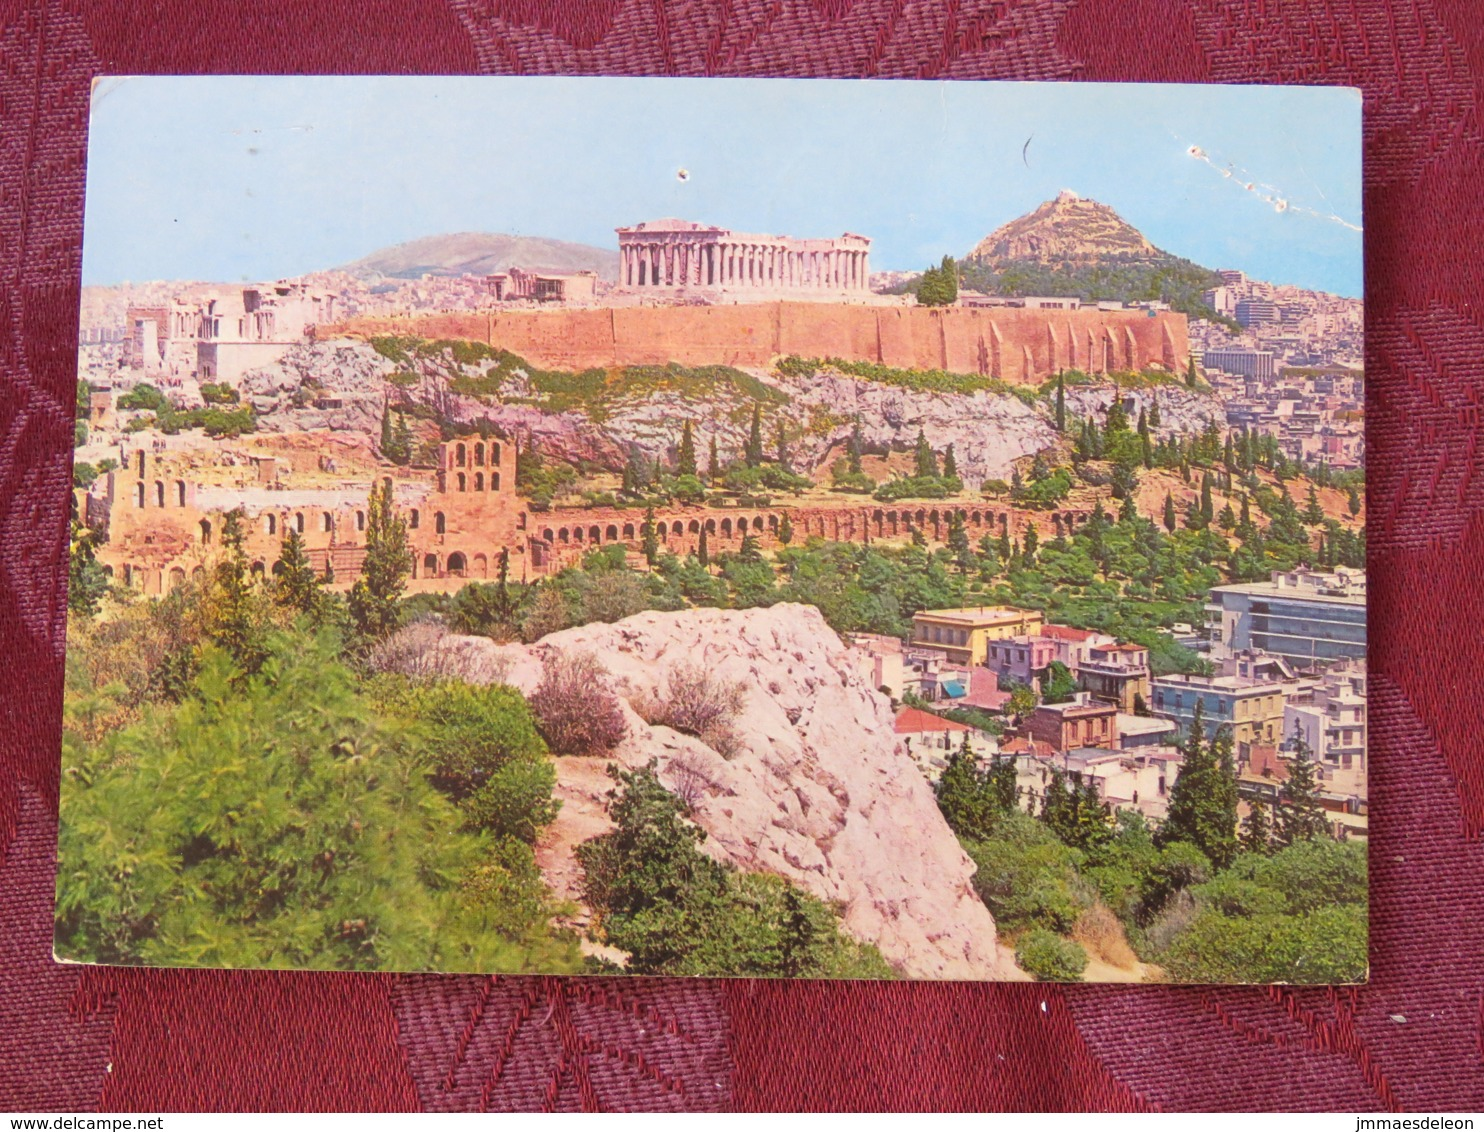 "Greece 1982 Postcard ""Athens Acropolis"" To England - Byzantine Book Illustration - Greece"